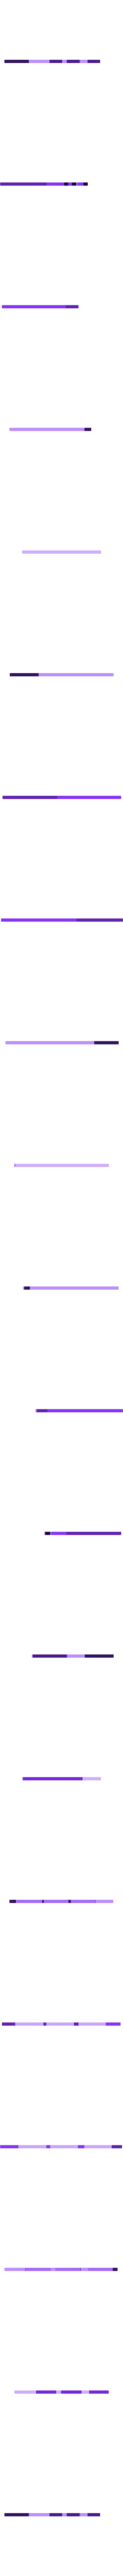 cote 1.stl Download STL file Module for mini drill and c is accessory N ° 2 • 3D printer model, prusai33